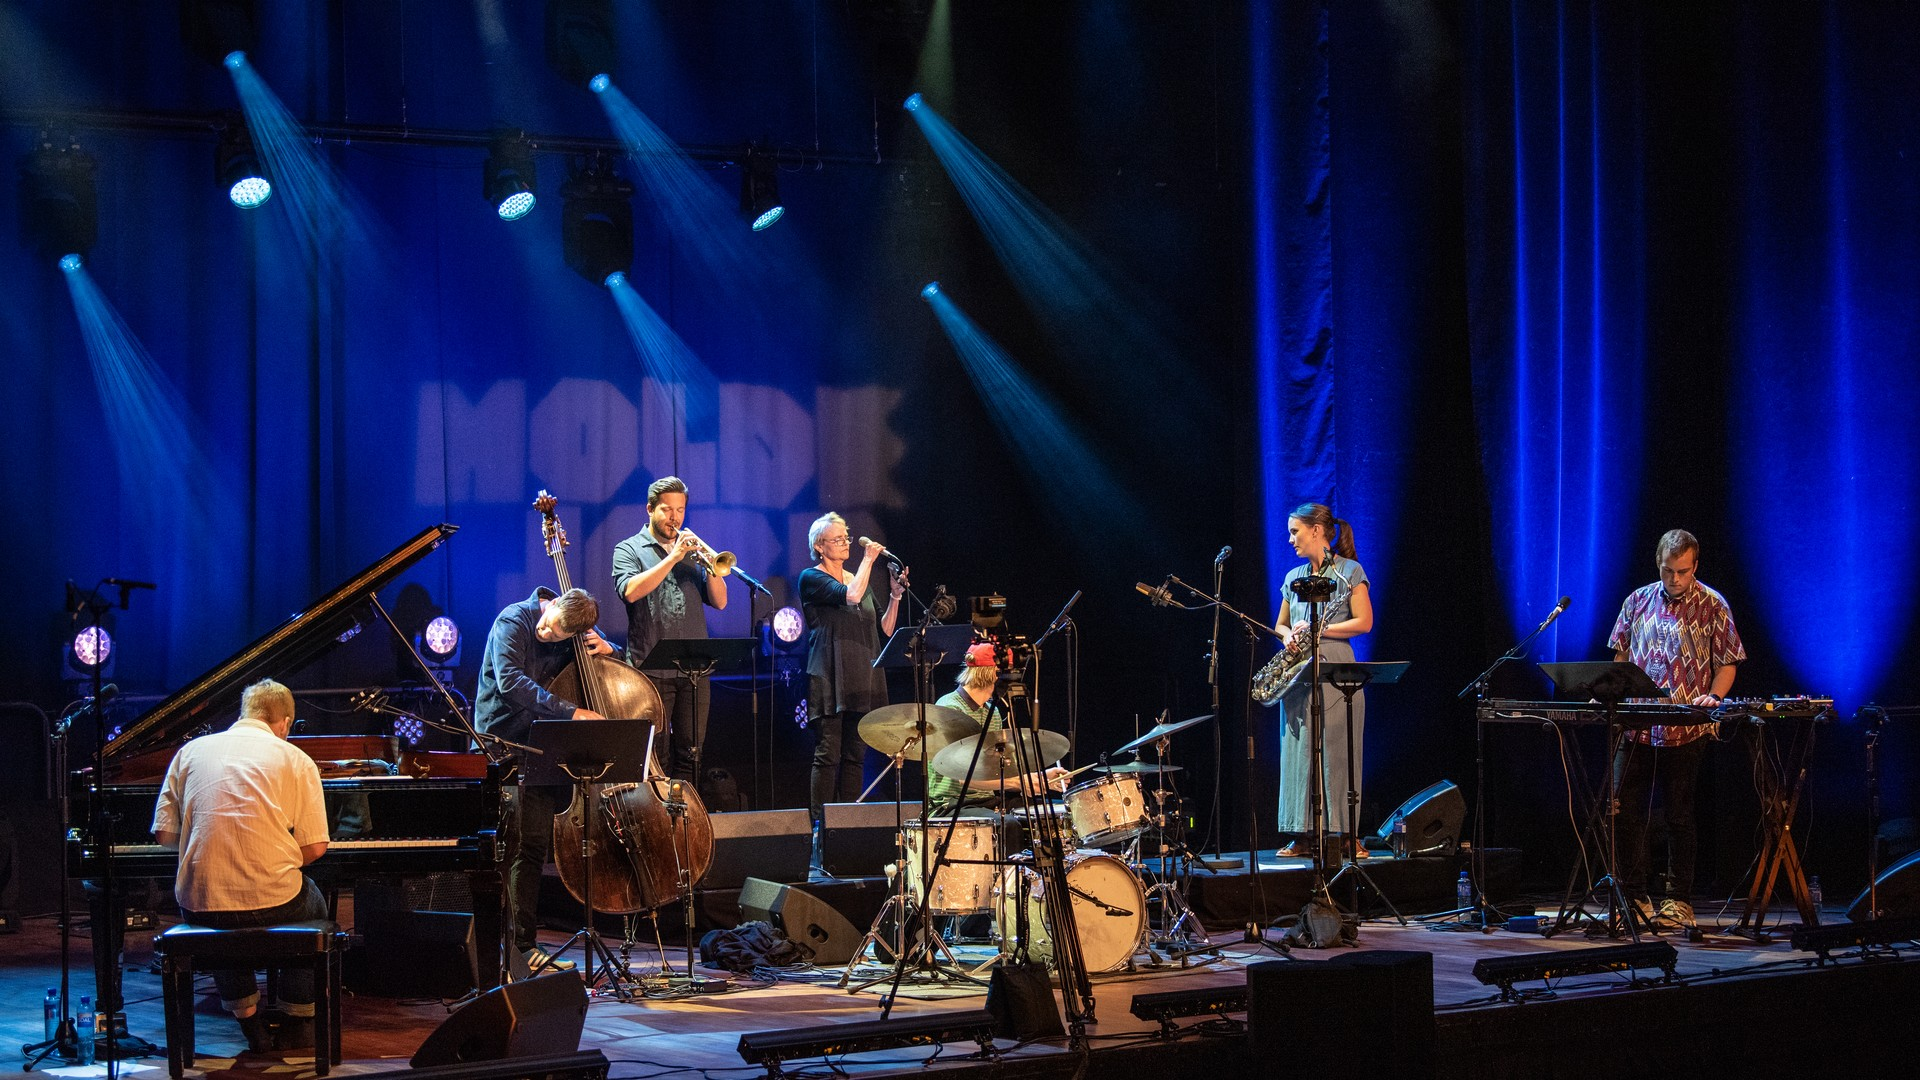 Hanna Paulsberg Concept konsert Moldejazz 2020